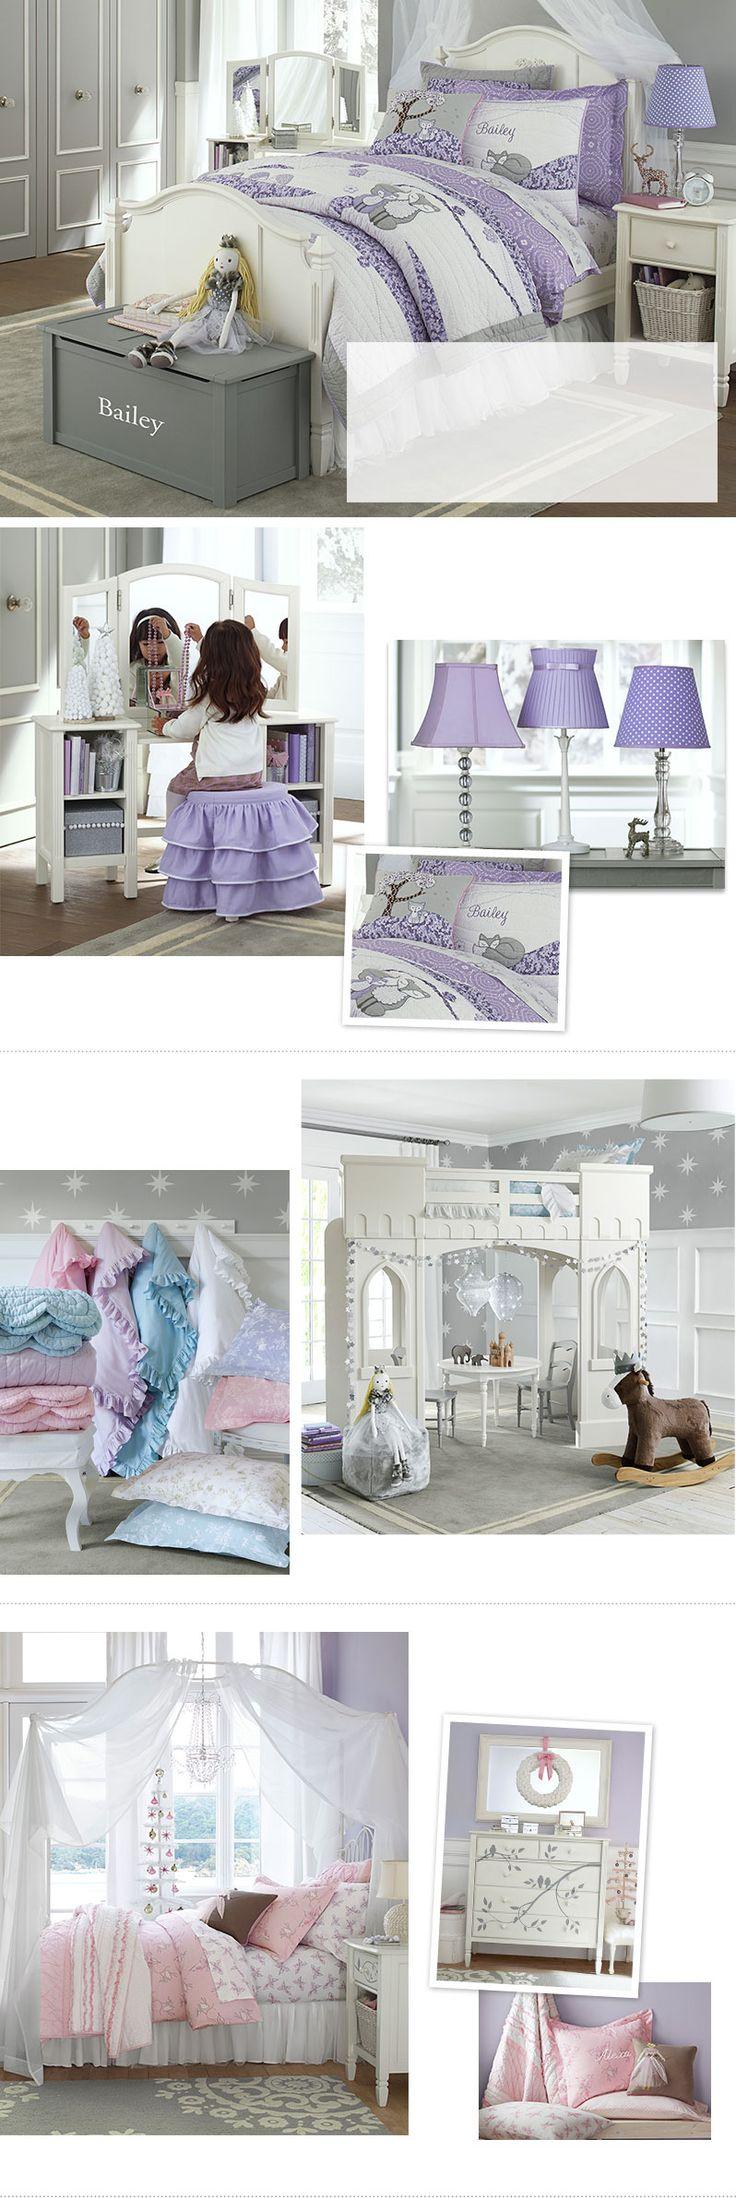 best girls room images on pinterest bedroom ideas child room